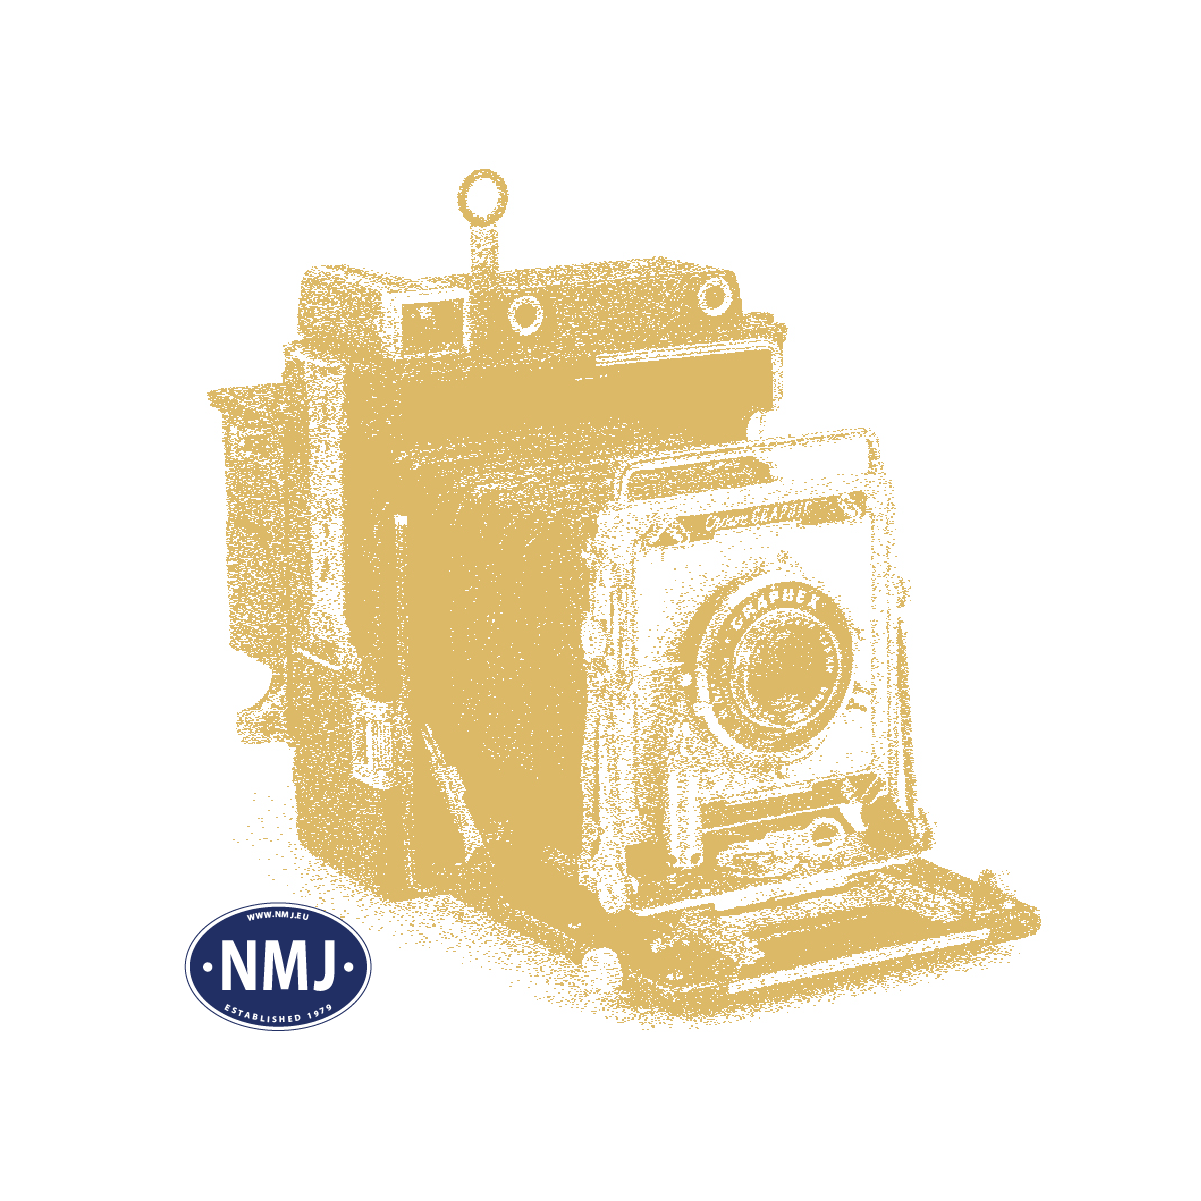 MDSVG4-227 - Brennesle, Fotoetset, 10 Stk, 1:45 - 48